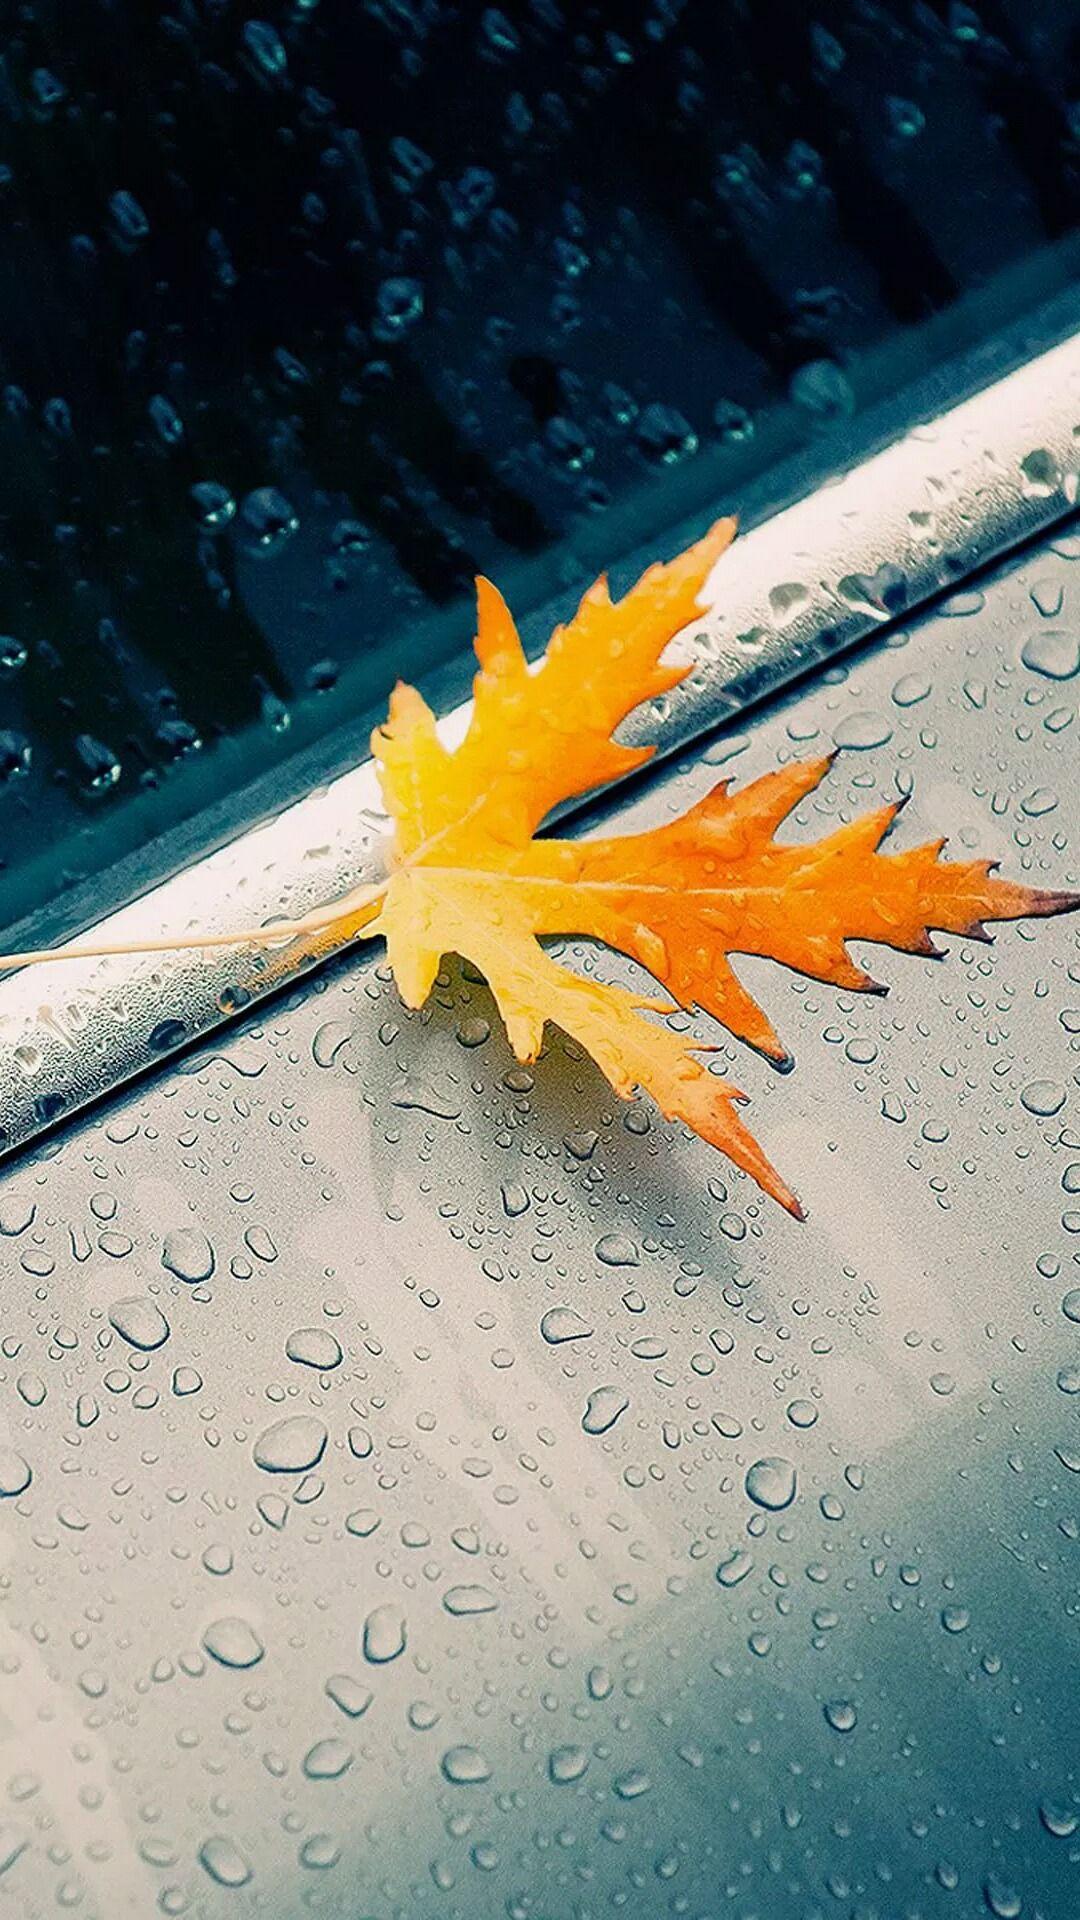 Autumn Rain iPhone wallpapers. Tap to see more Fall season iPhone wallpapers, lockscreen, fondos ...